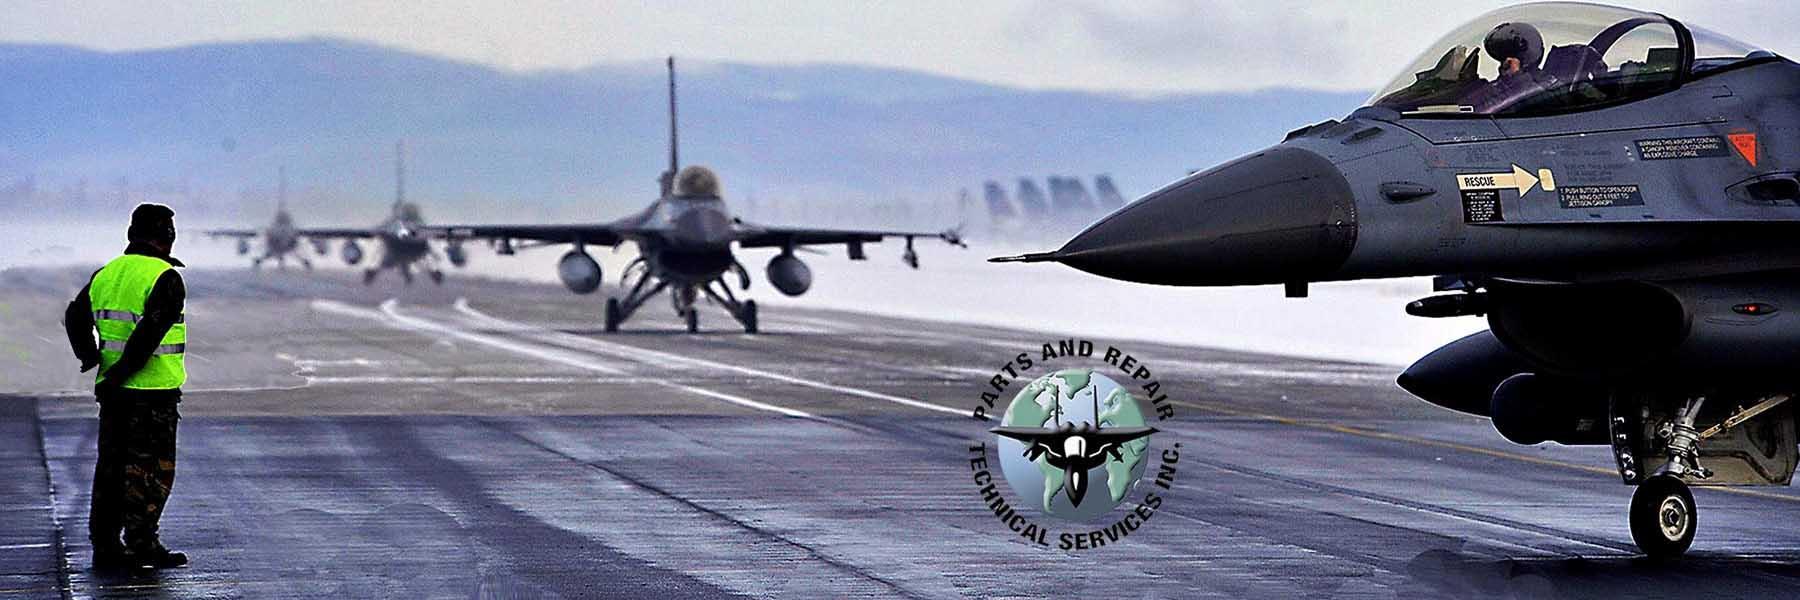 <br><br>P.A.R.T.S. Inc. --- (678) 325-6950 <br>Pipeline To An Airborne World